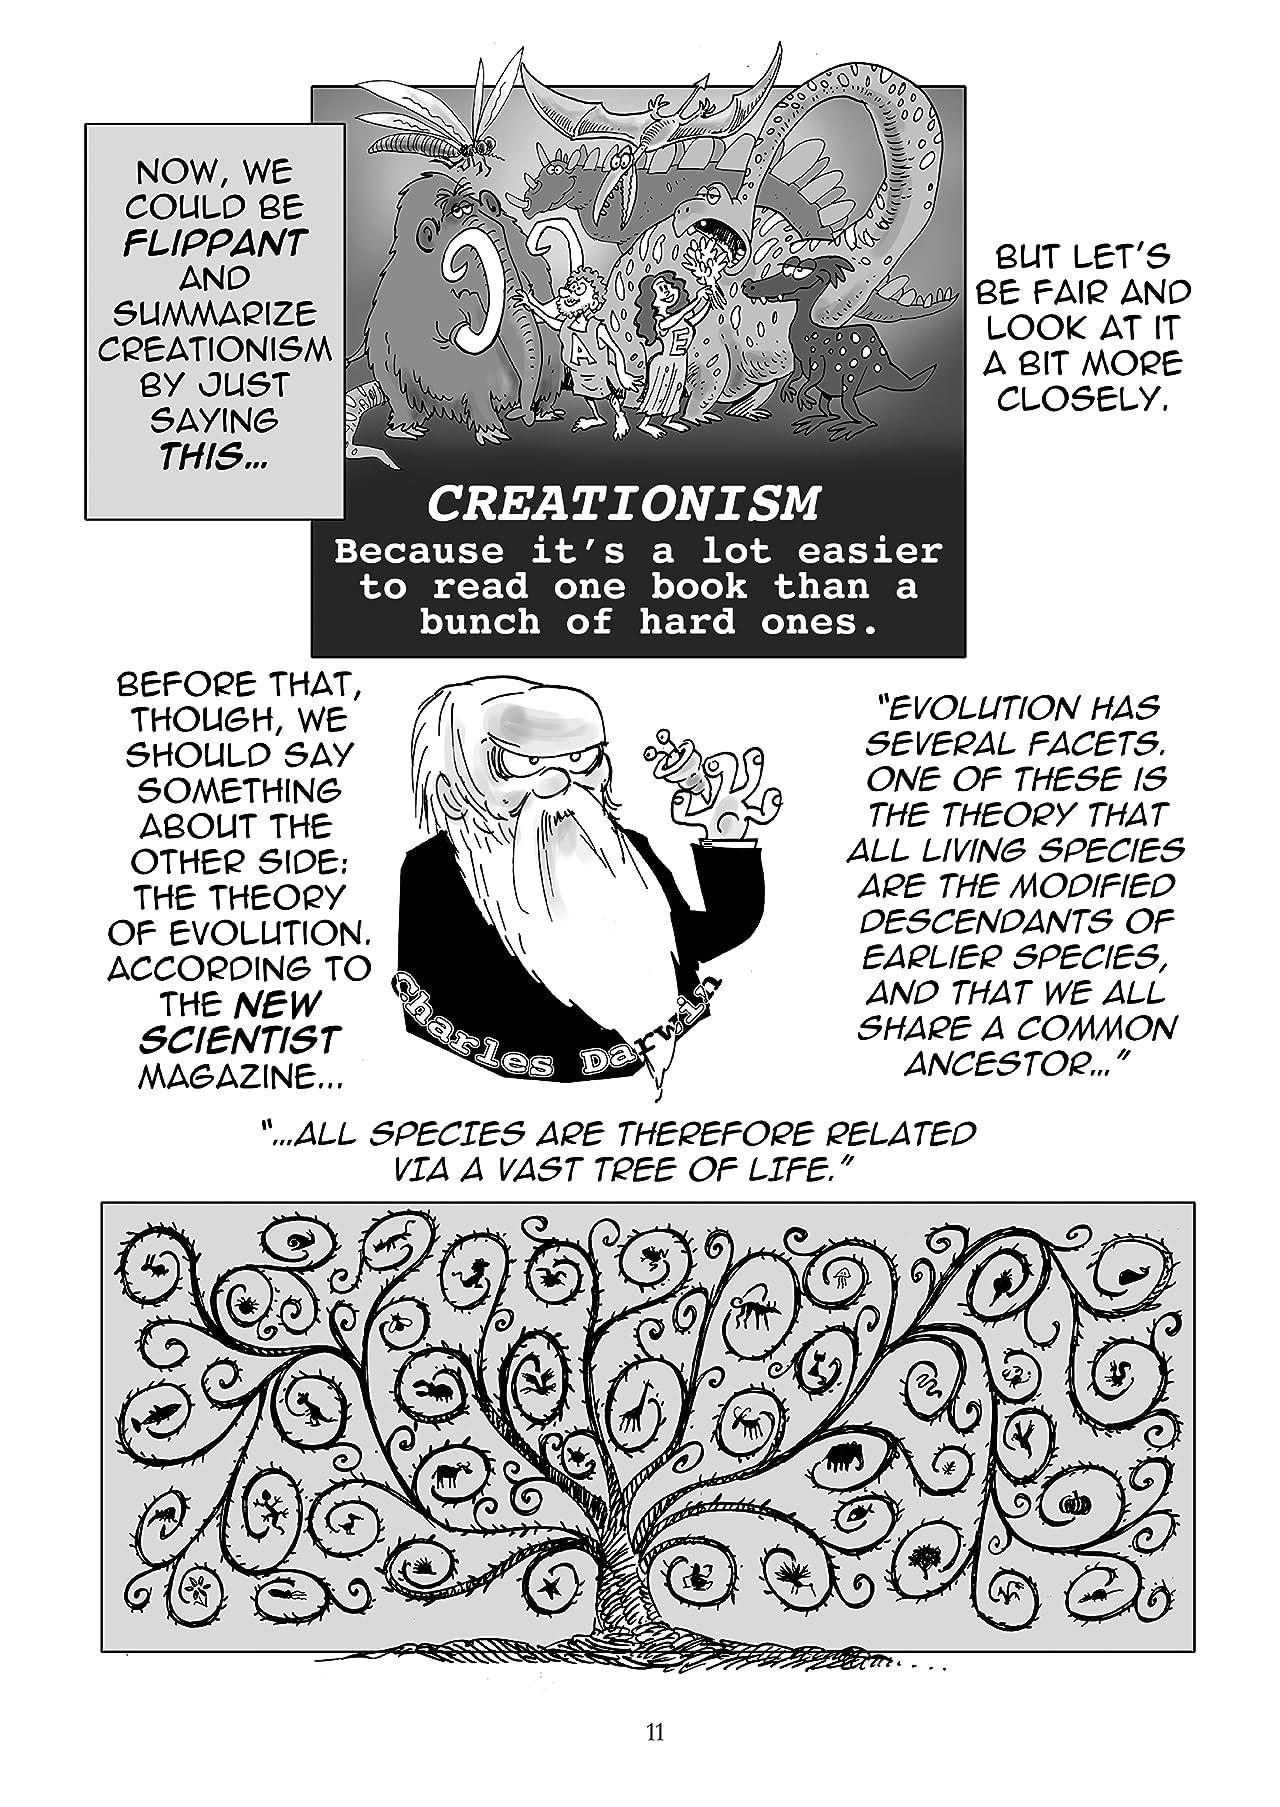 Goodbye God?: An Illustrated Exploration of Science v Religion